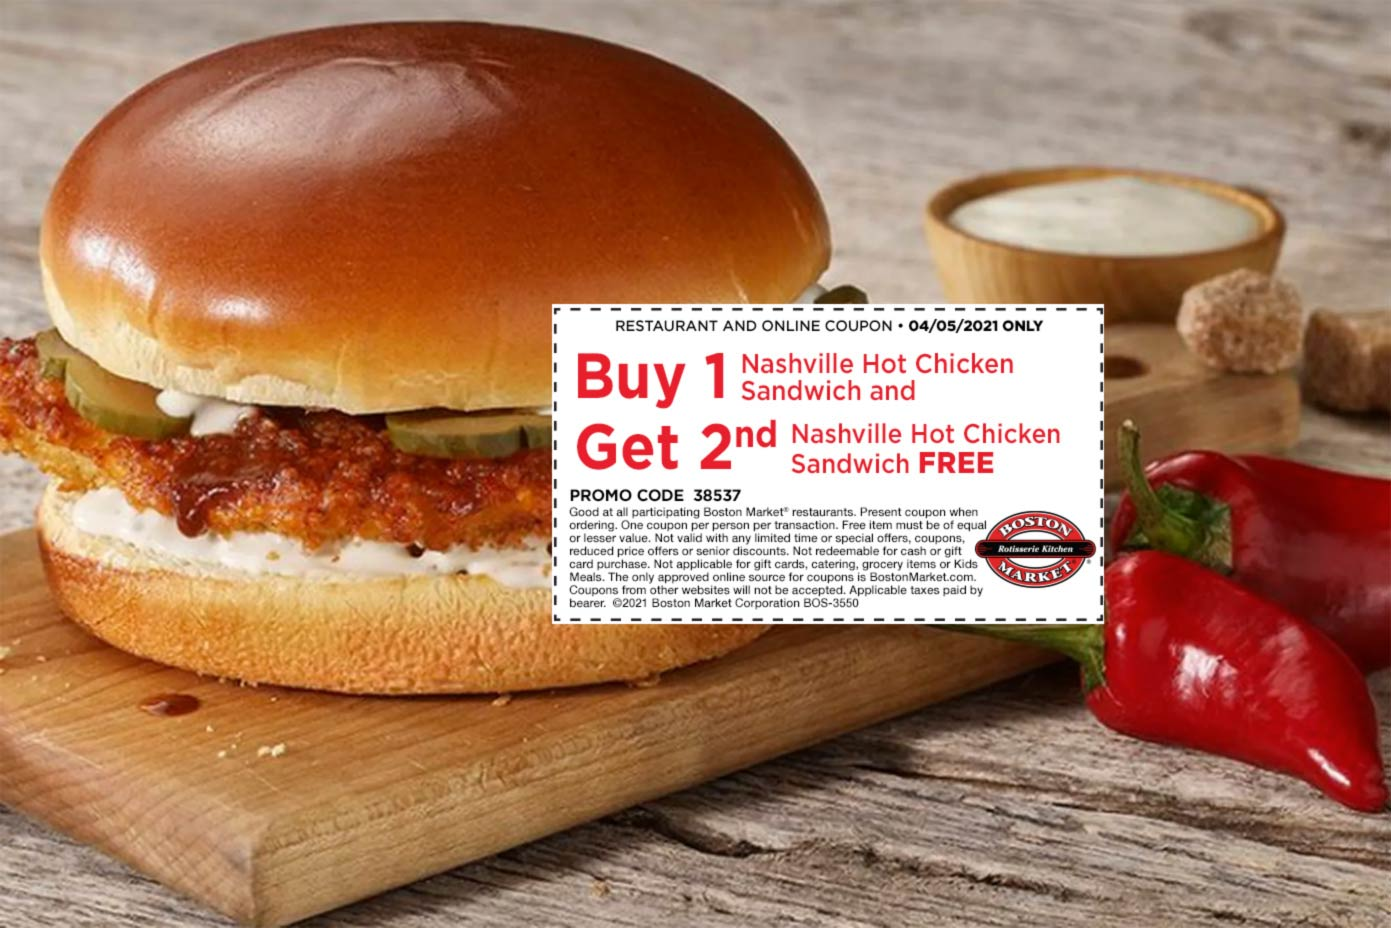 Boston Market restaurants Coupon  Second Nashville hot chicken sandwich free today at Boston Market #bostonmarket